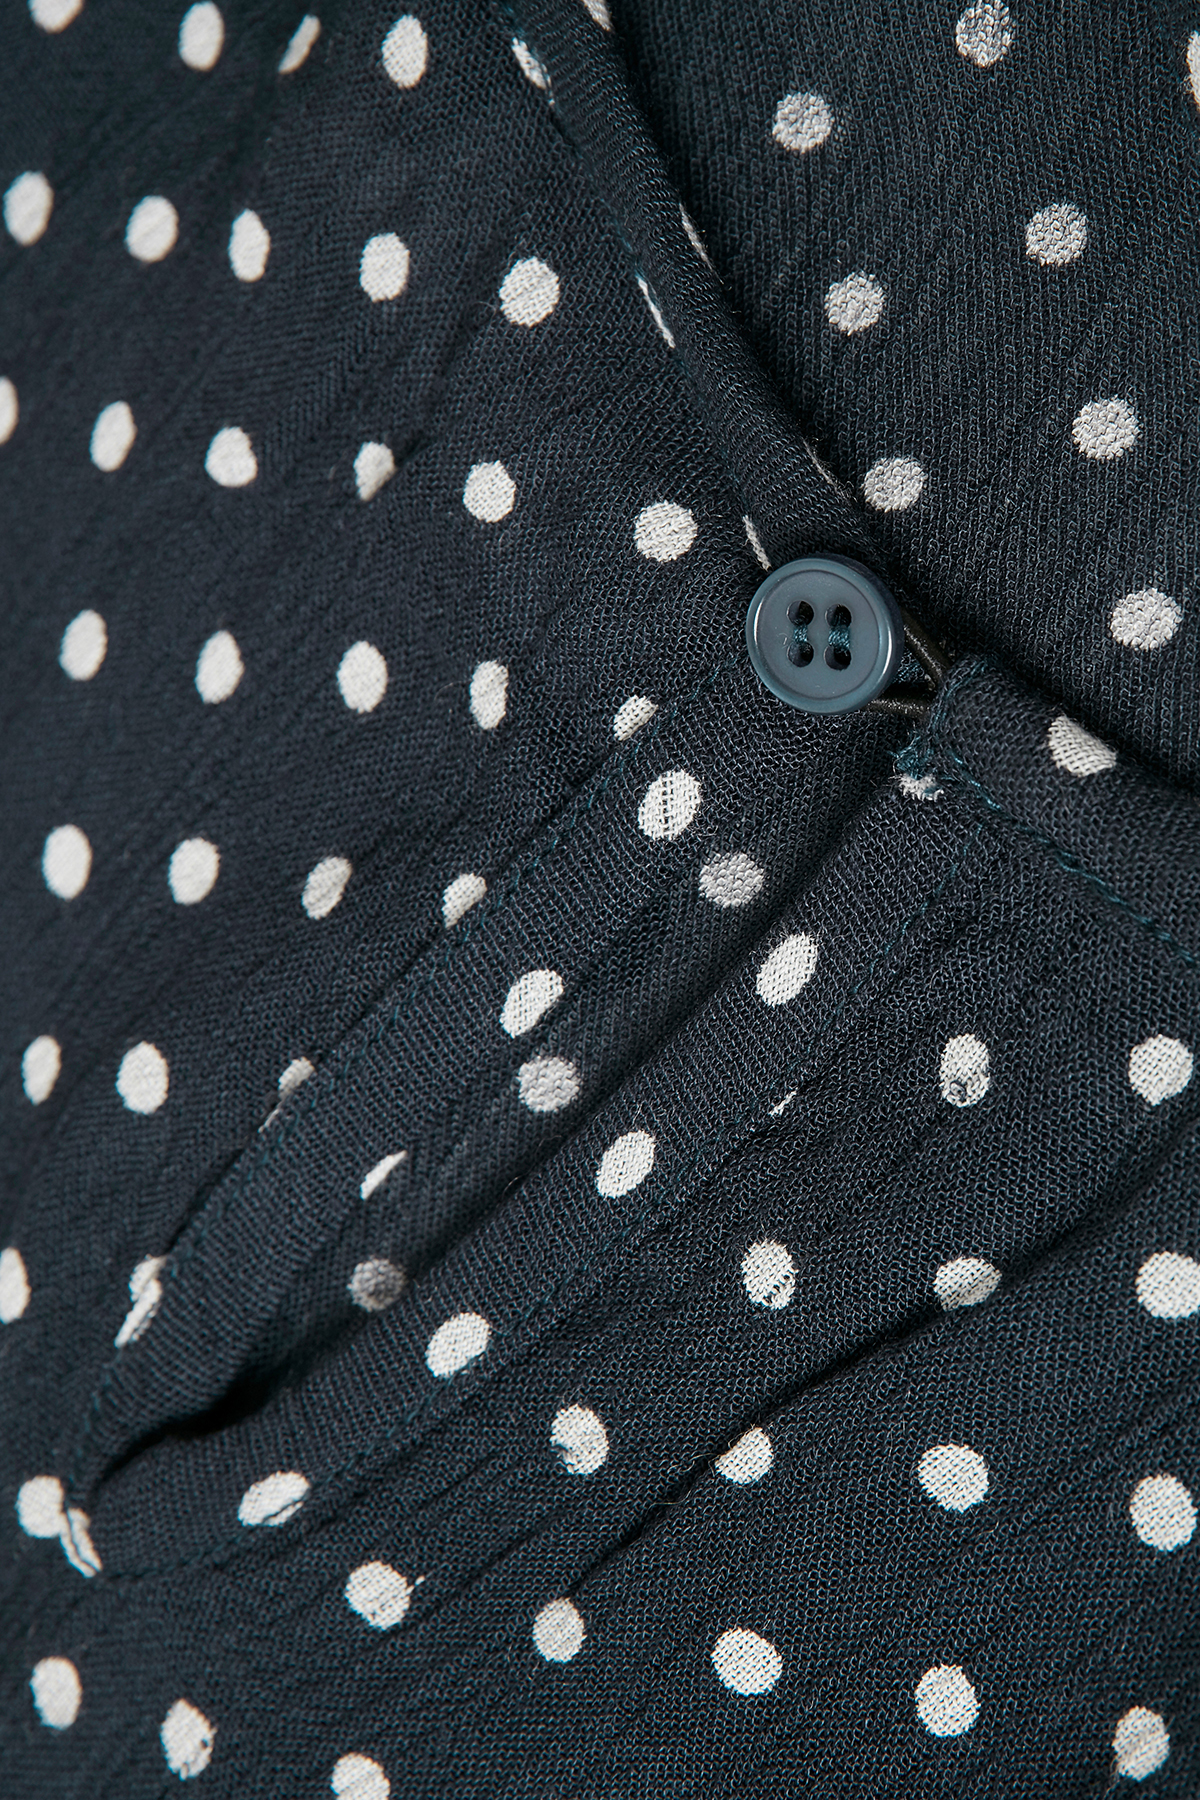 Marineblau/wollweiß Kurzarm-Bluse von Kaffe – Shoppen Sie Marineblau/wollweiß Kurzarm-Bluse ab Gr. 34-46 hier